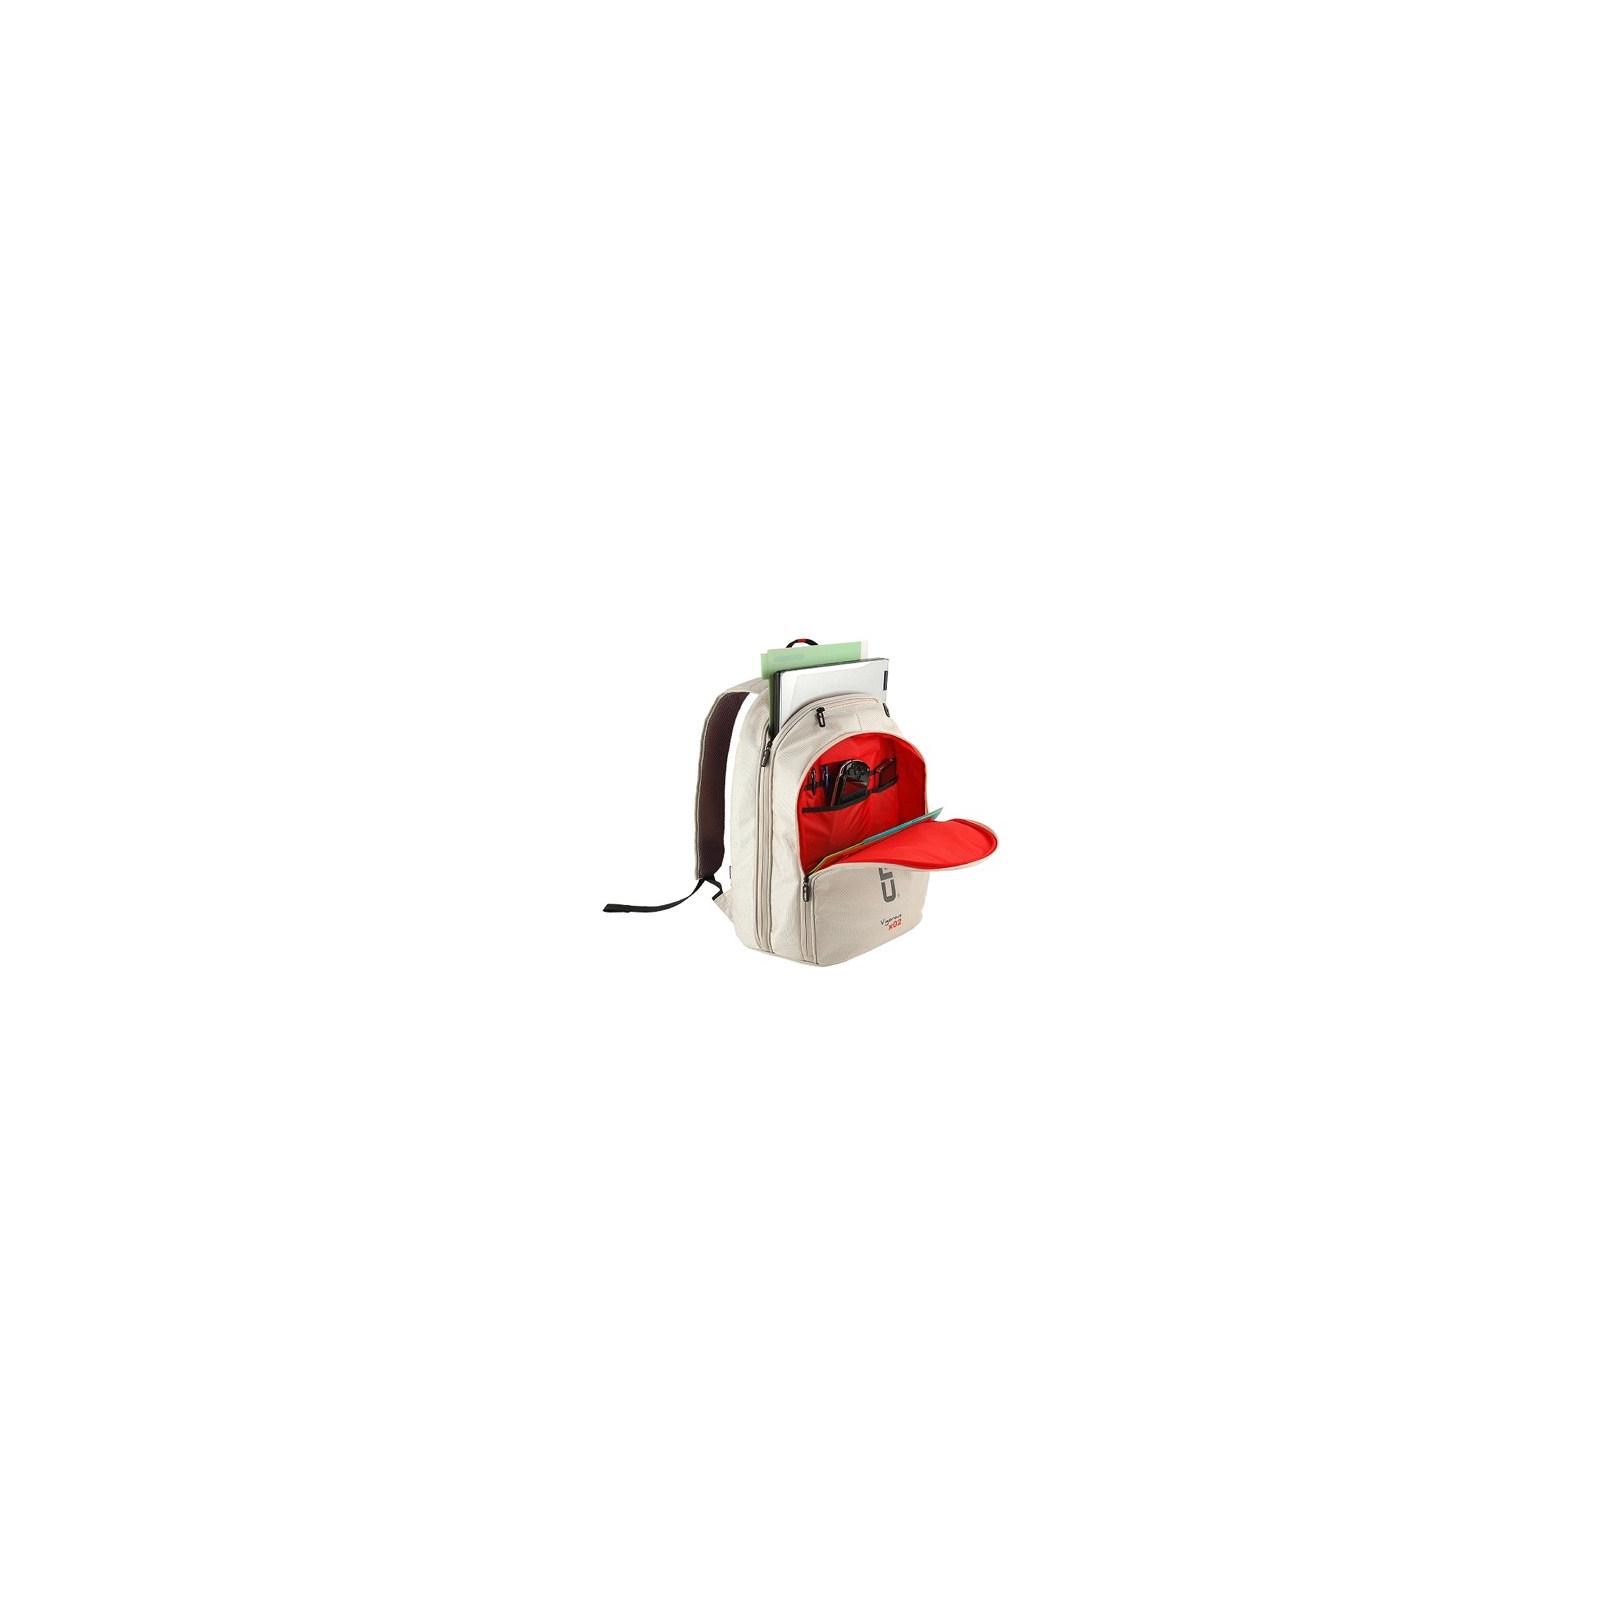 Рюкзак для ноутбука Crown 15.6 Vigorous x02 (BPV215W) изображение 2